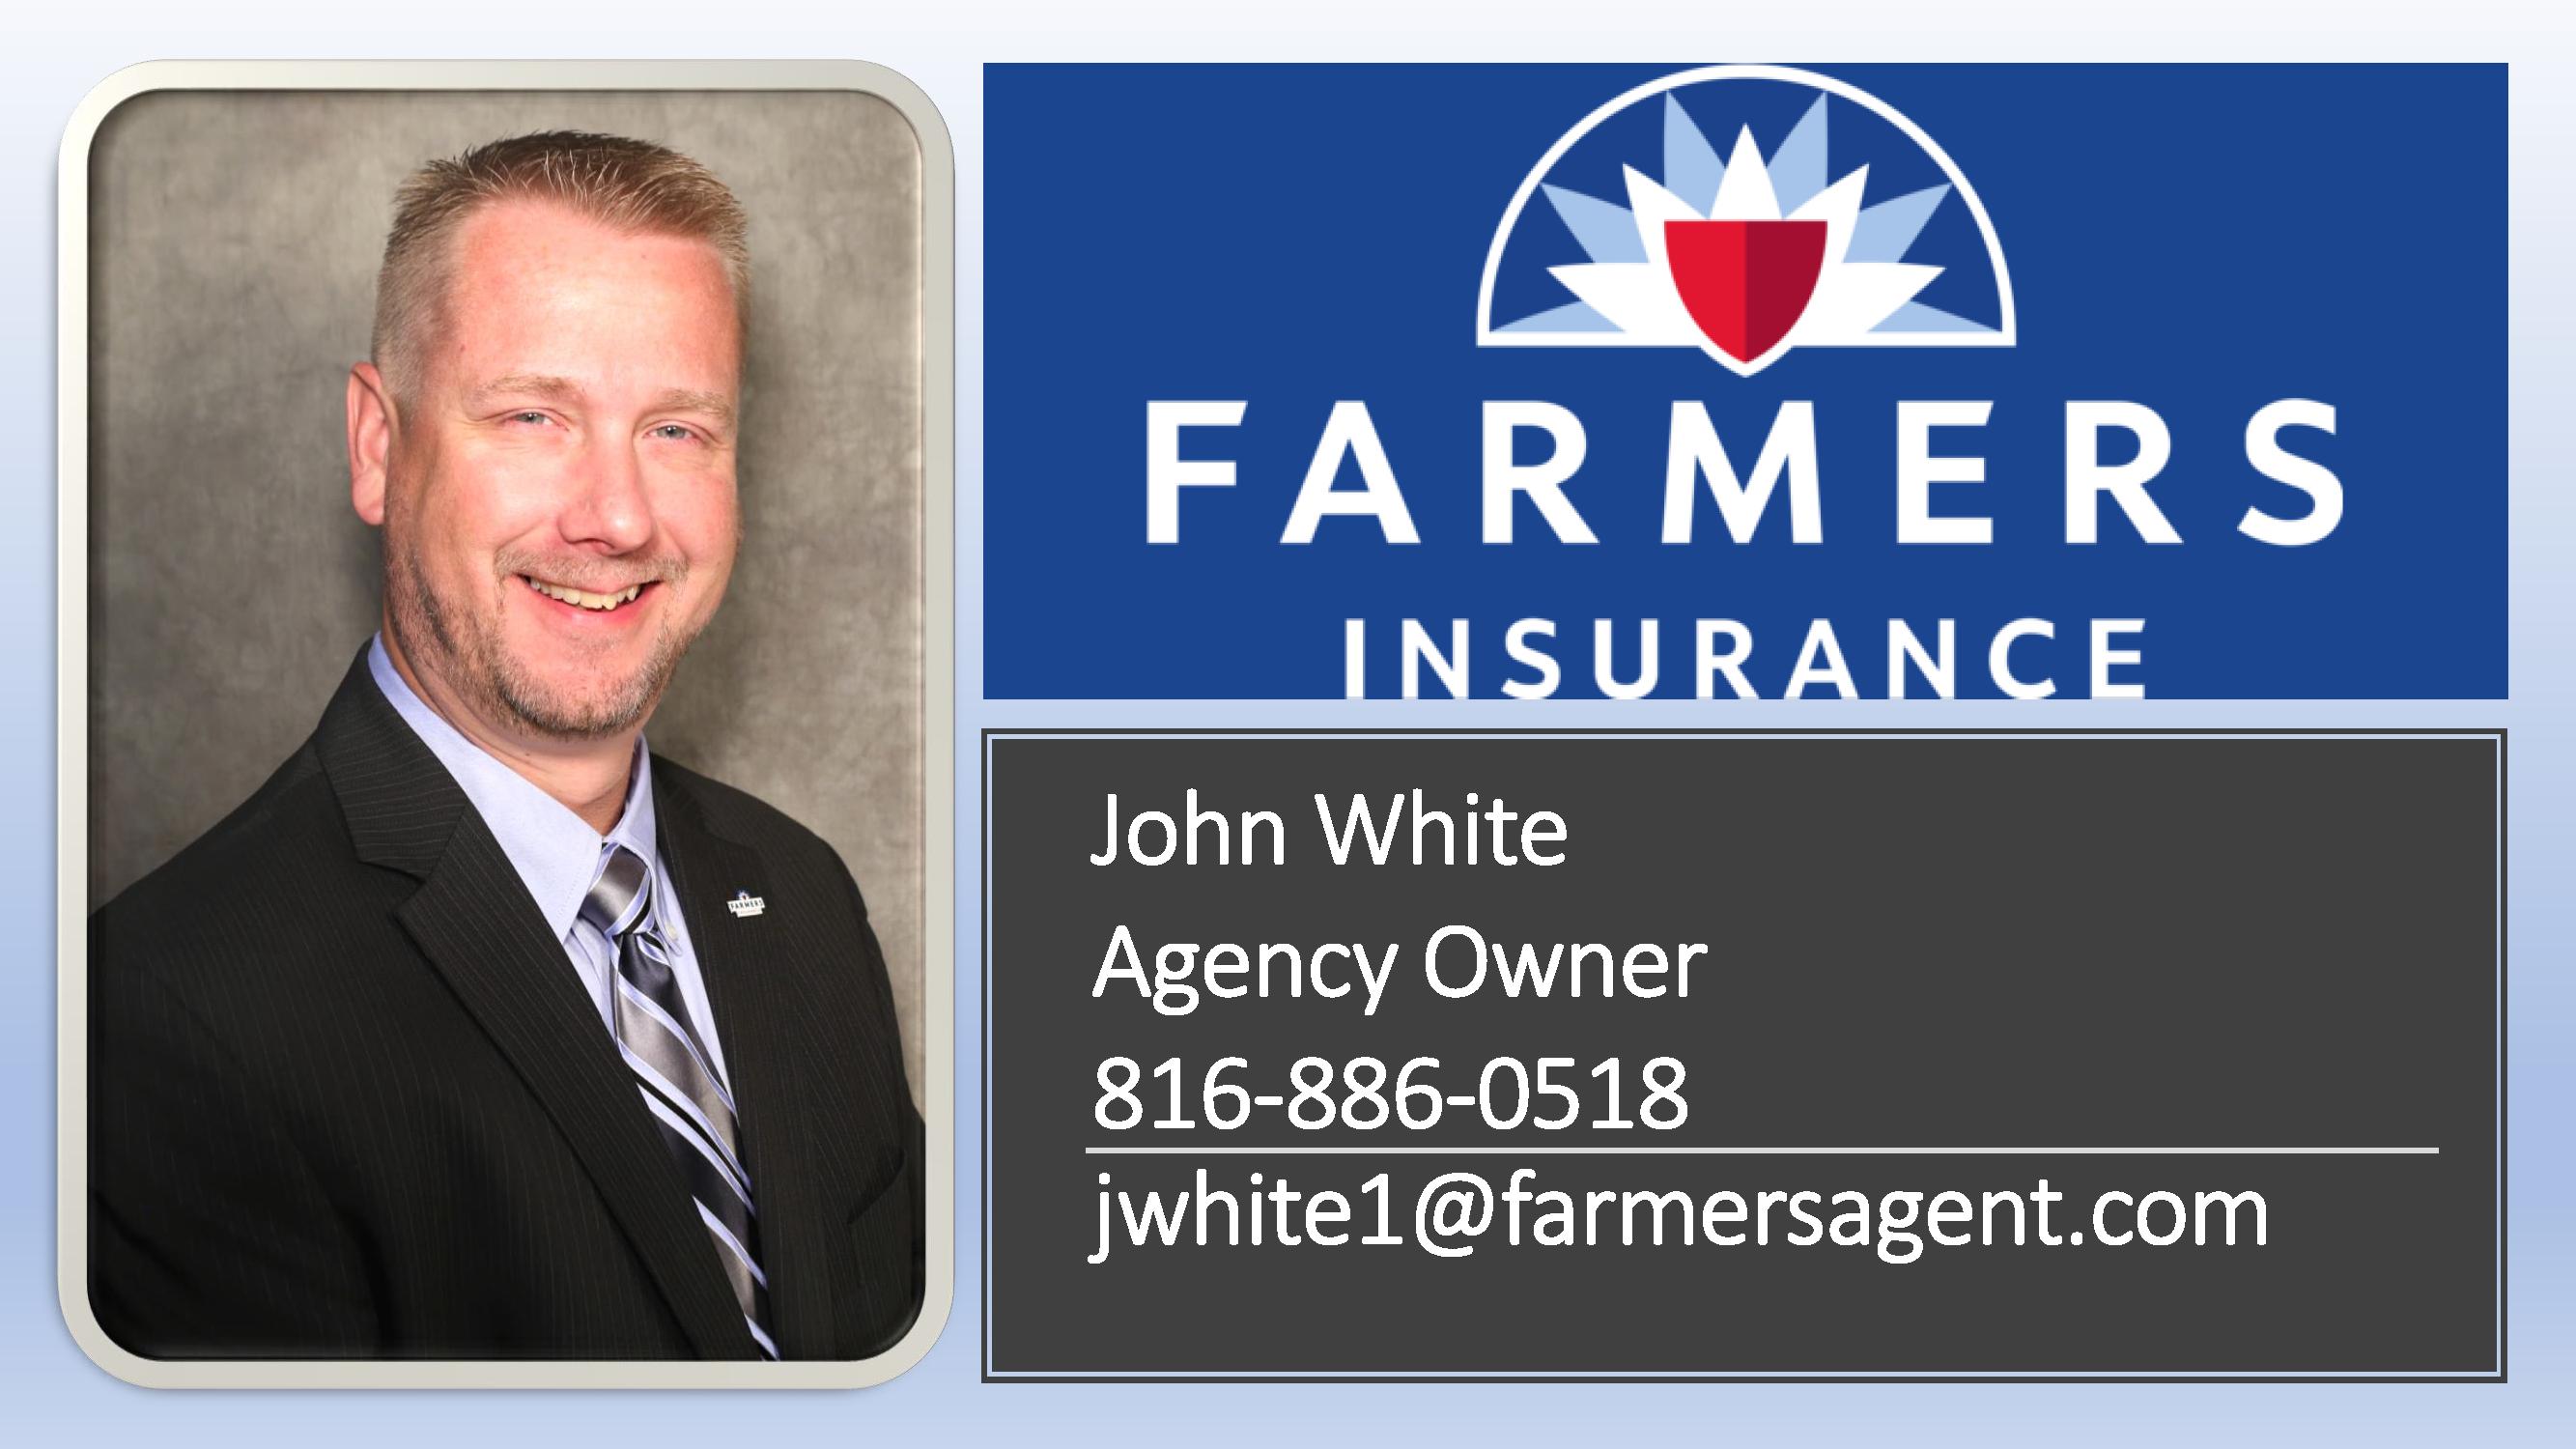 Farmers Insurance - John White